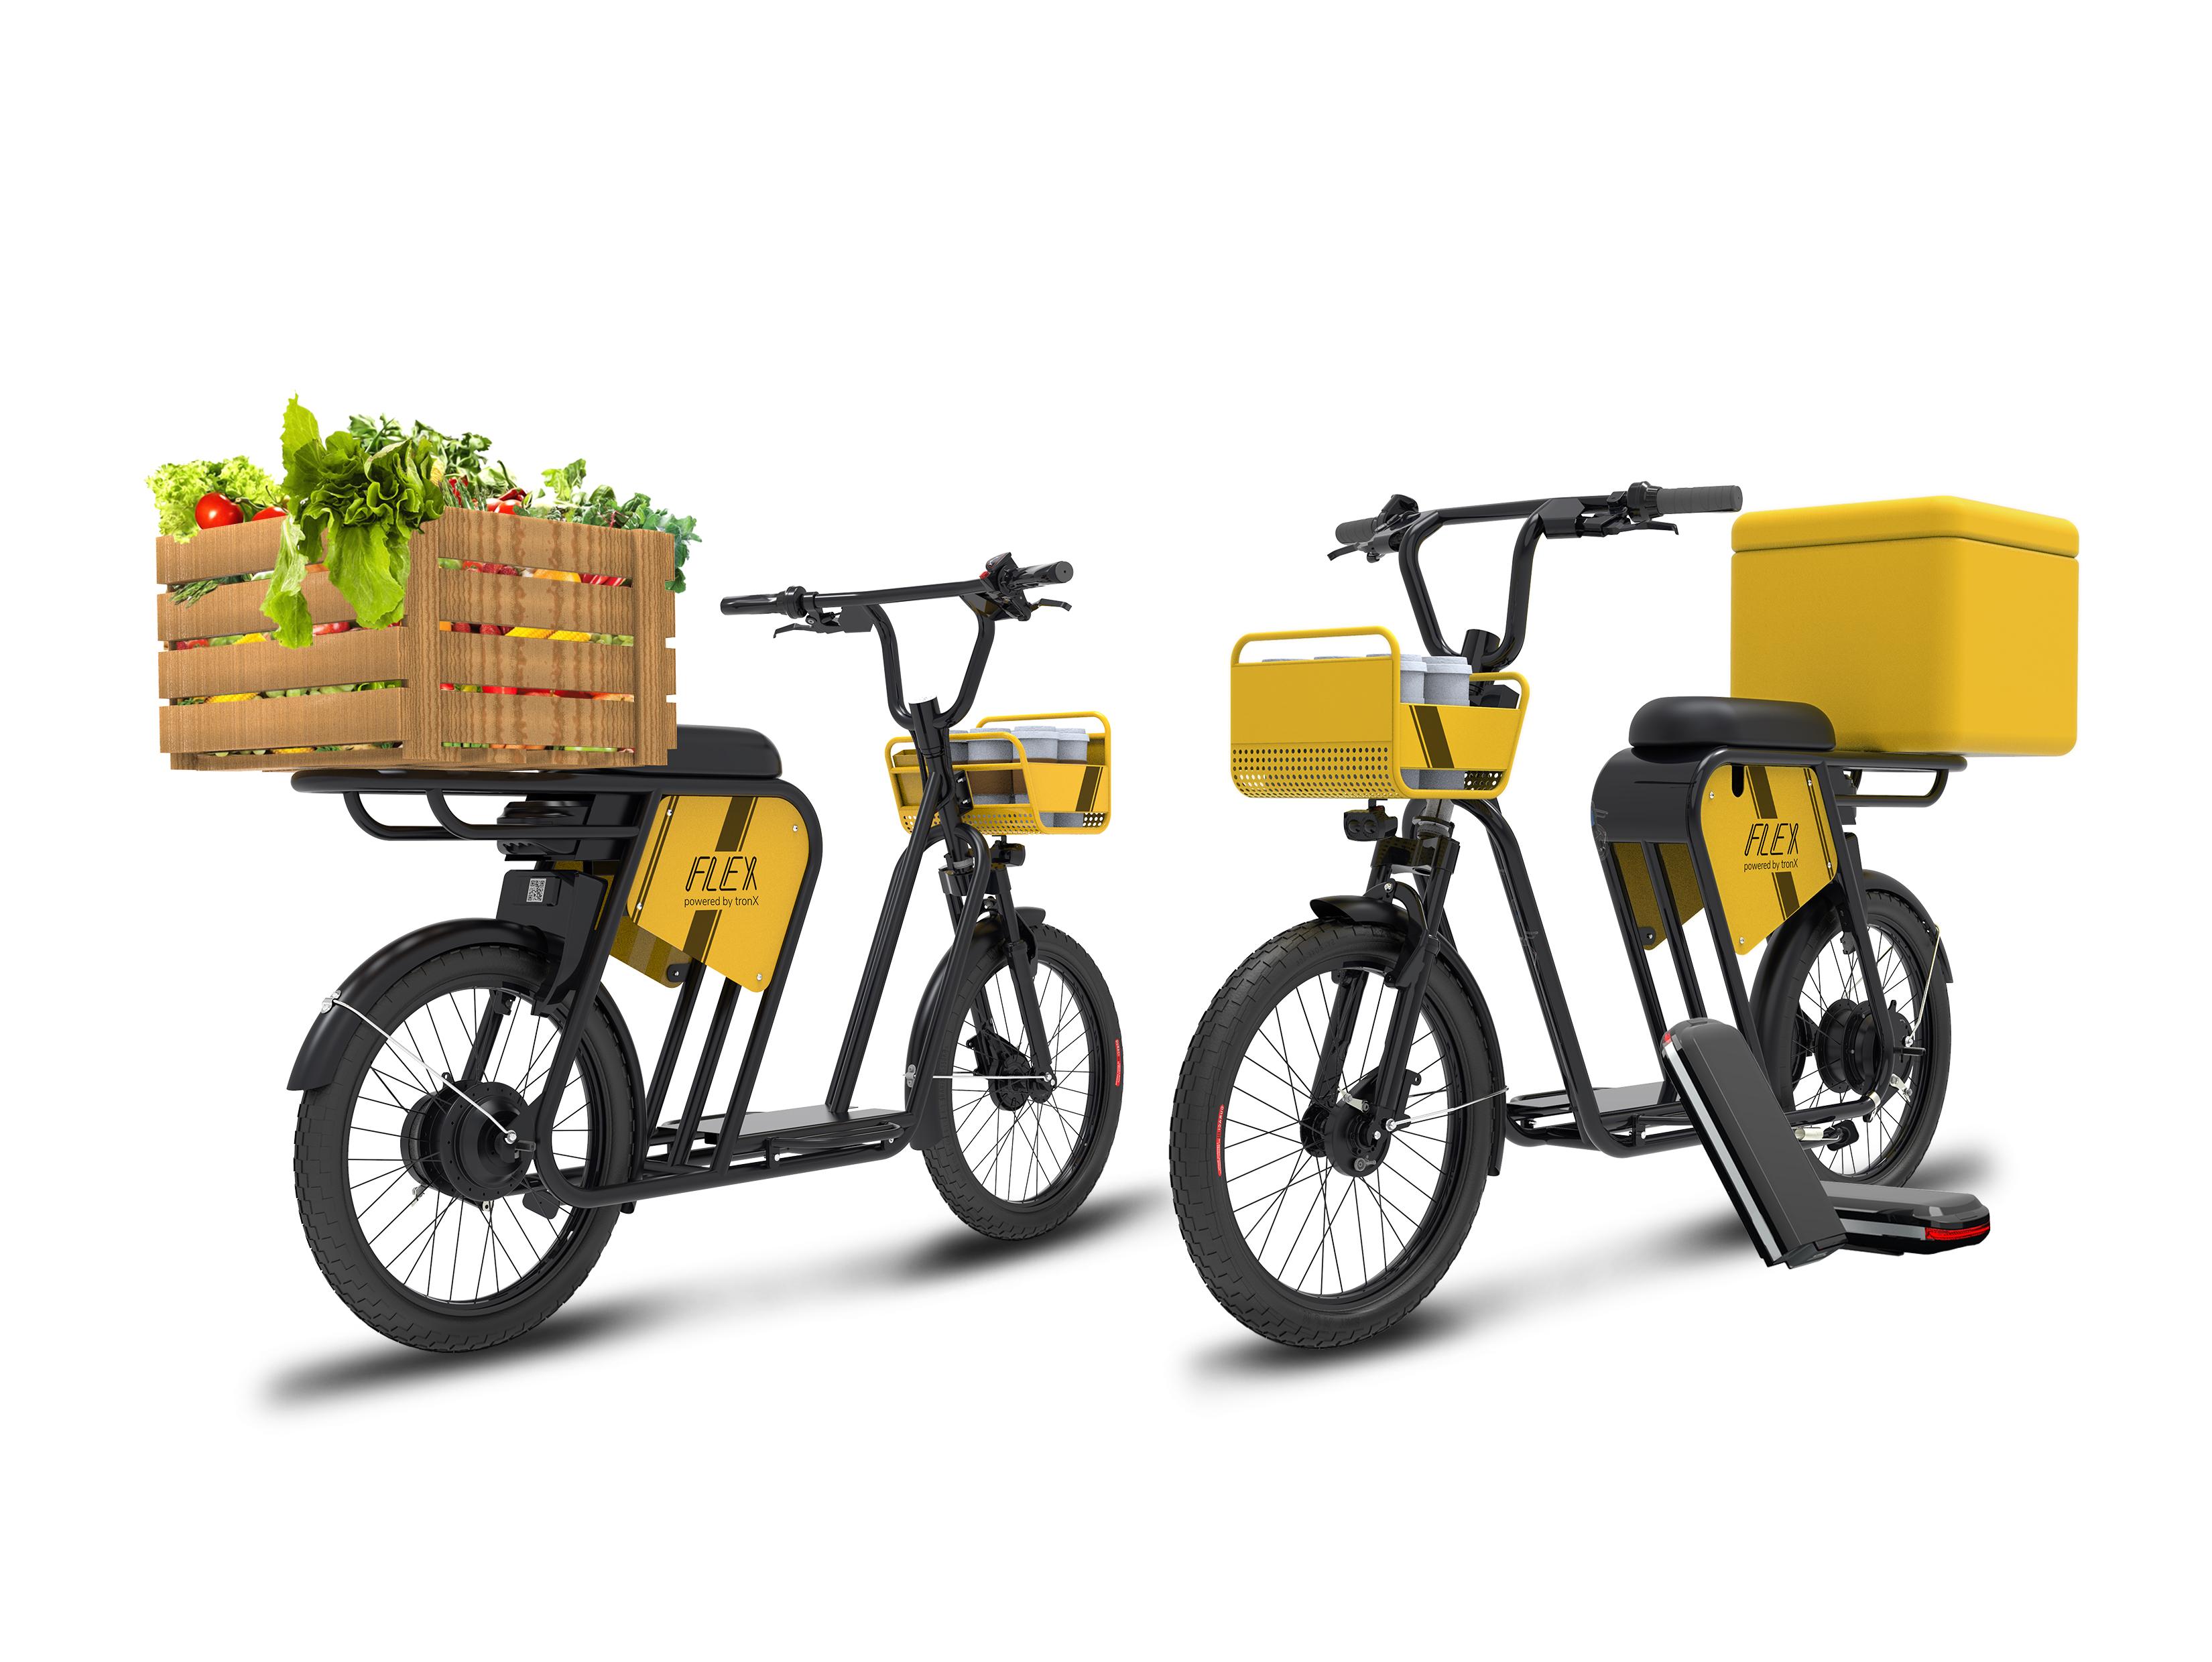 Smartron launches all new electric cargo bike platform: tbike flex